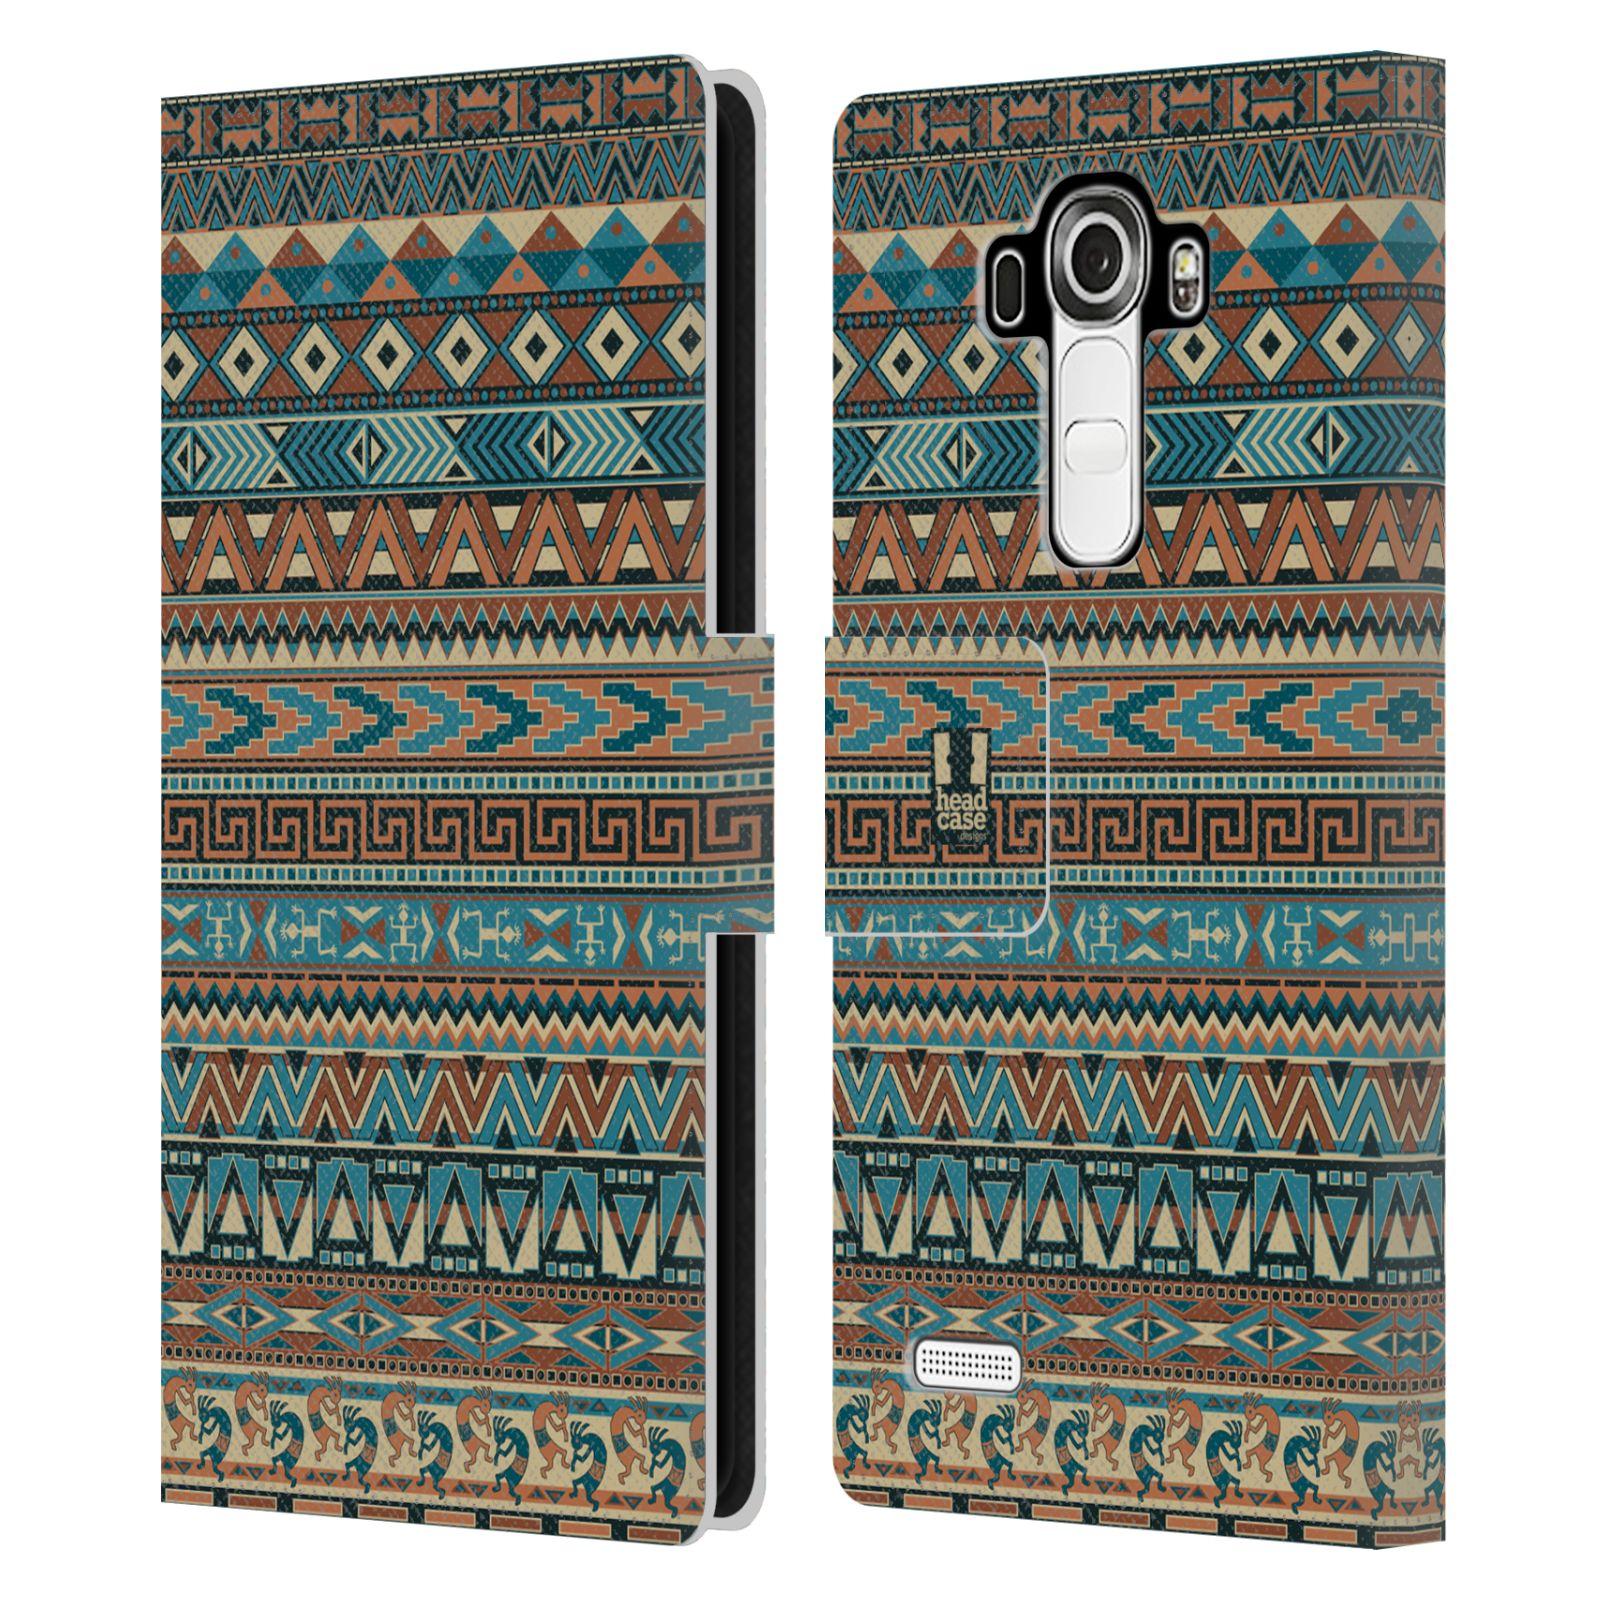 HEAD CASE Flipové pouzdro pro mobil LG G4 (H815) Indiánský vzor BLUE modrá